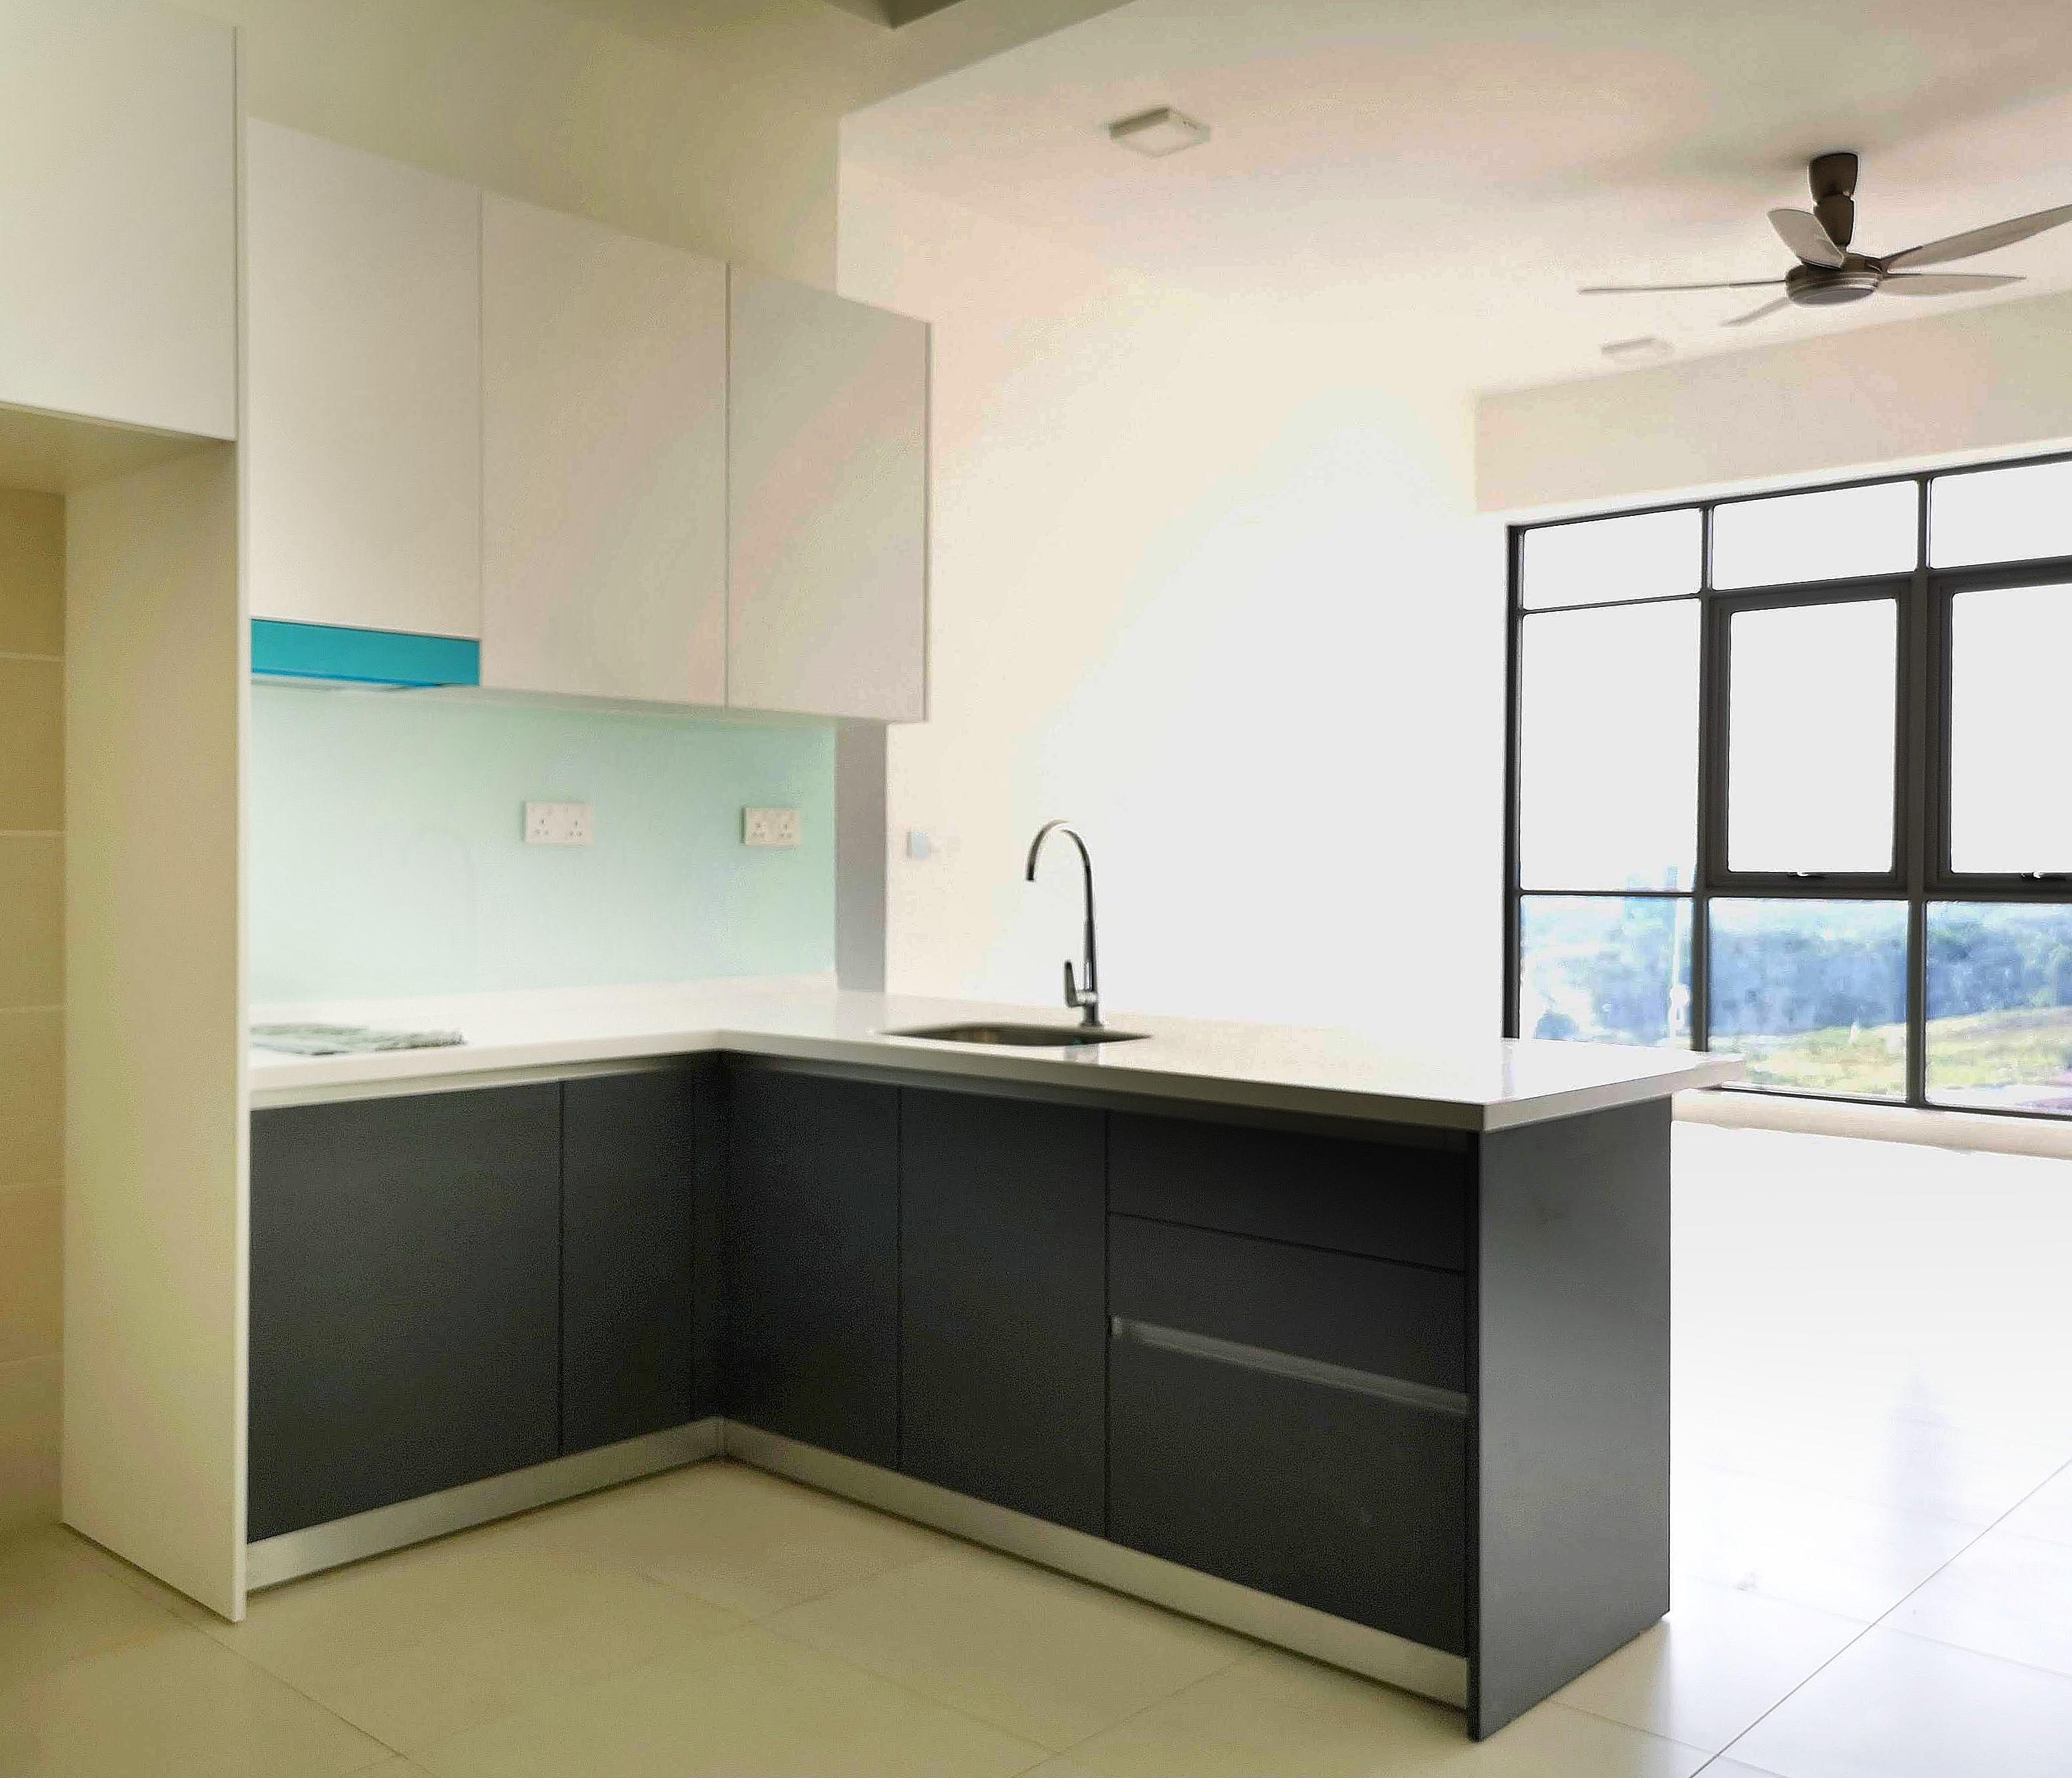 Gabungan Aqrs Bhd Living A Quality Life In Johor Bahru City